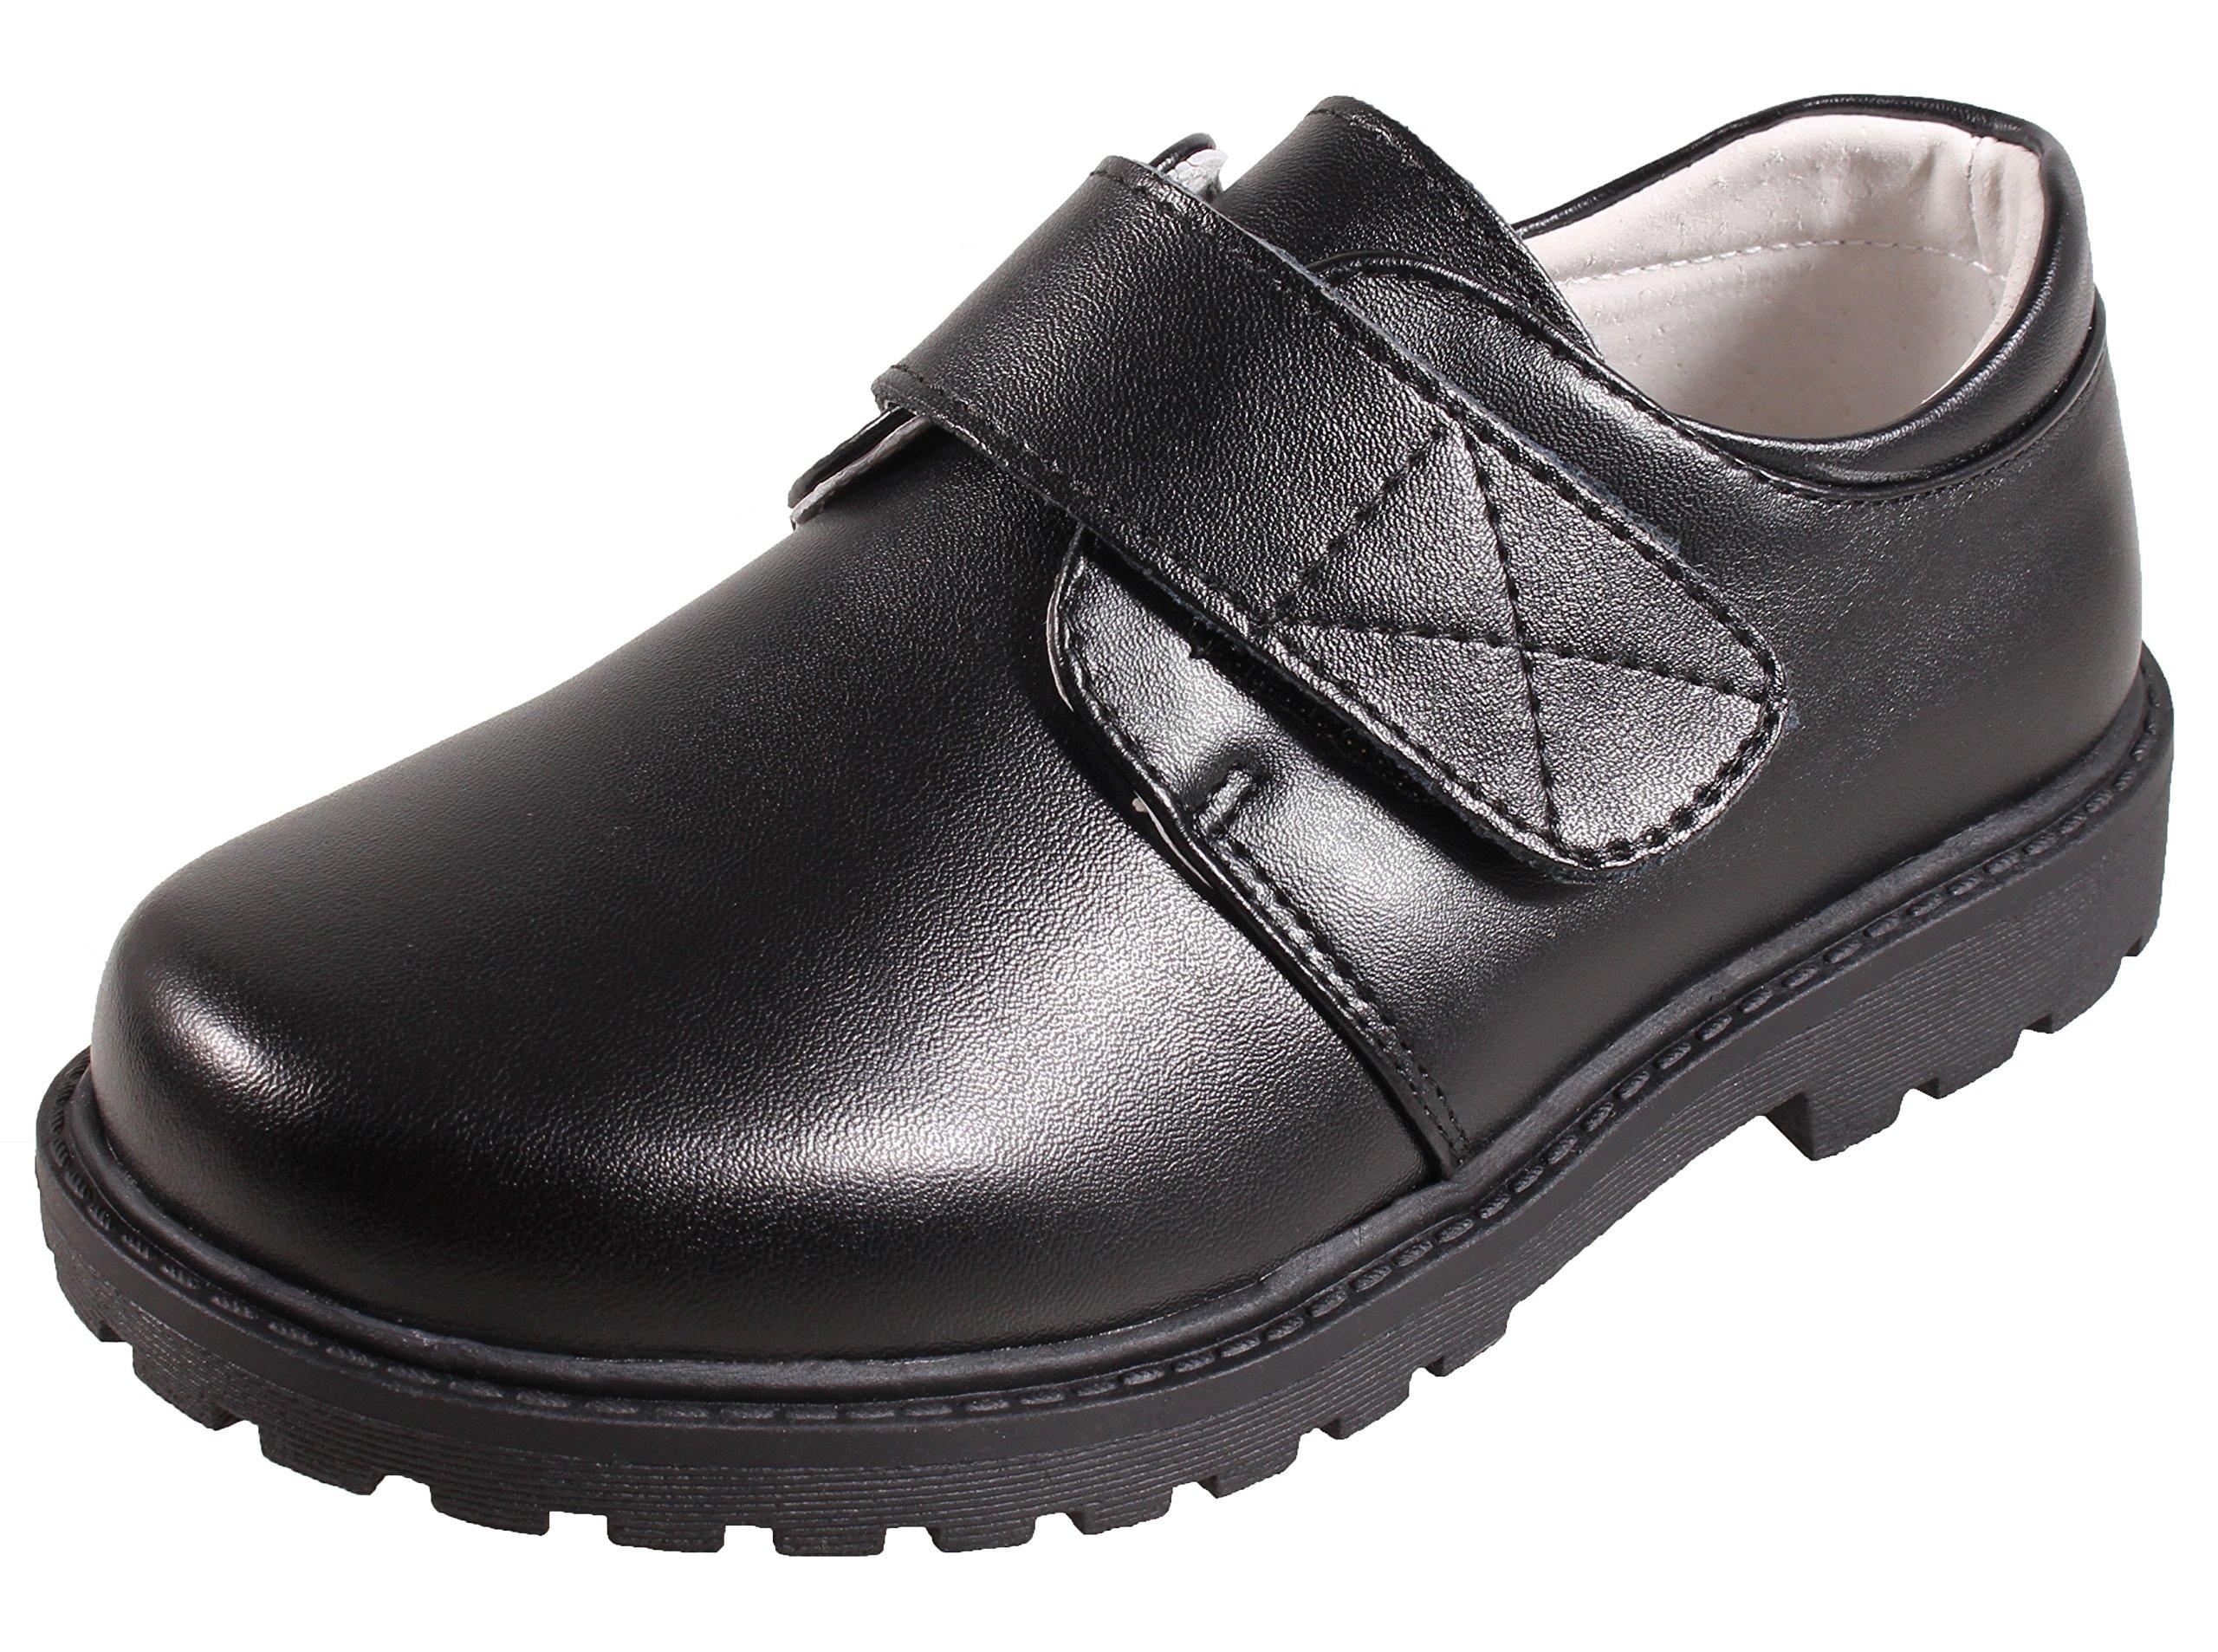 Boys Leather Black School Uniform Dress Oxford Outdoor Shoe(Toddler/Little Kid/Big Kid) Size 10 M US Toddler Kid